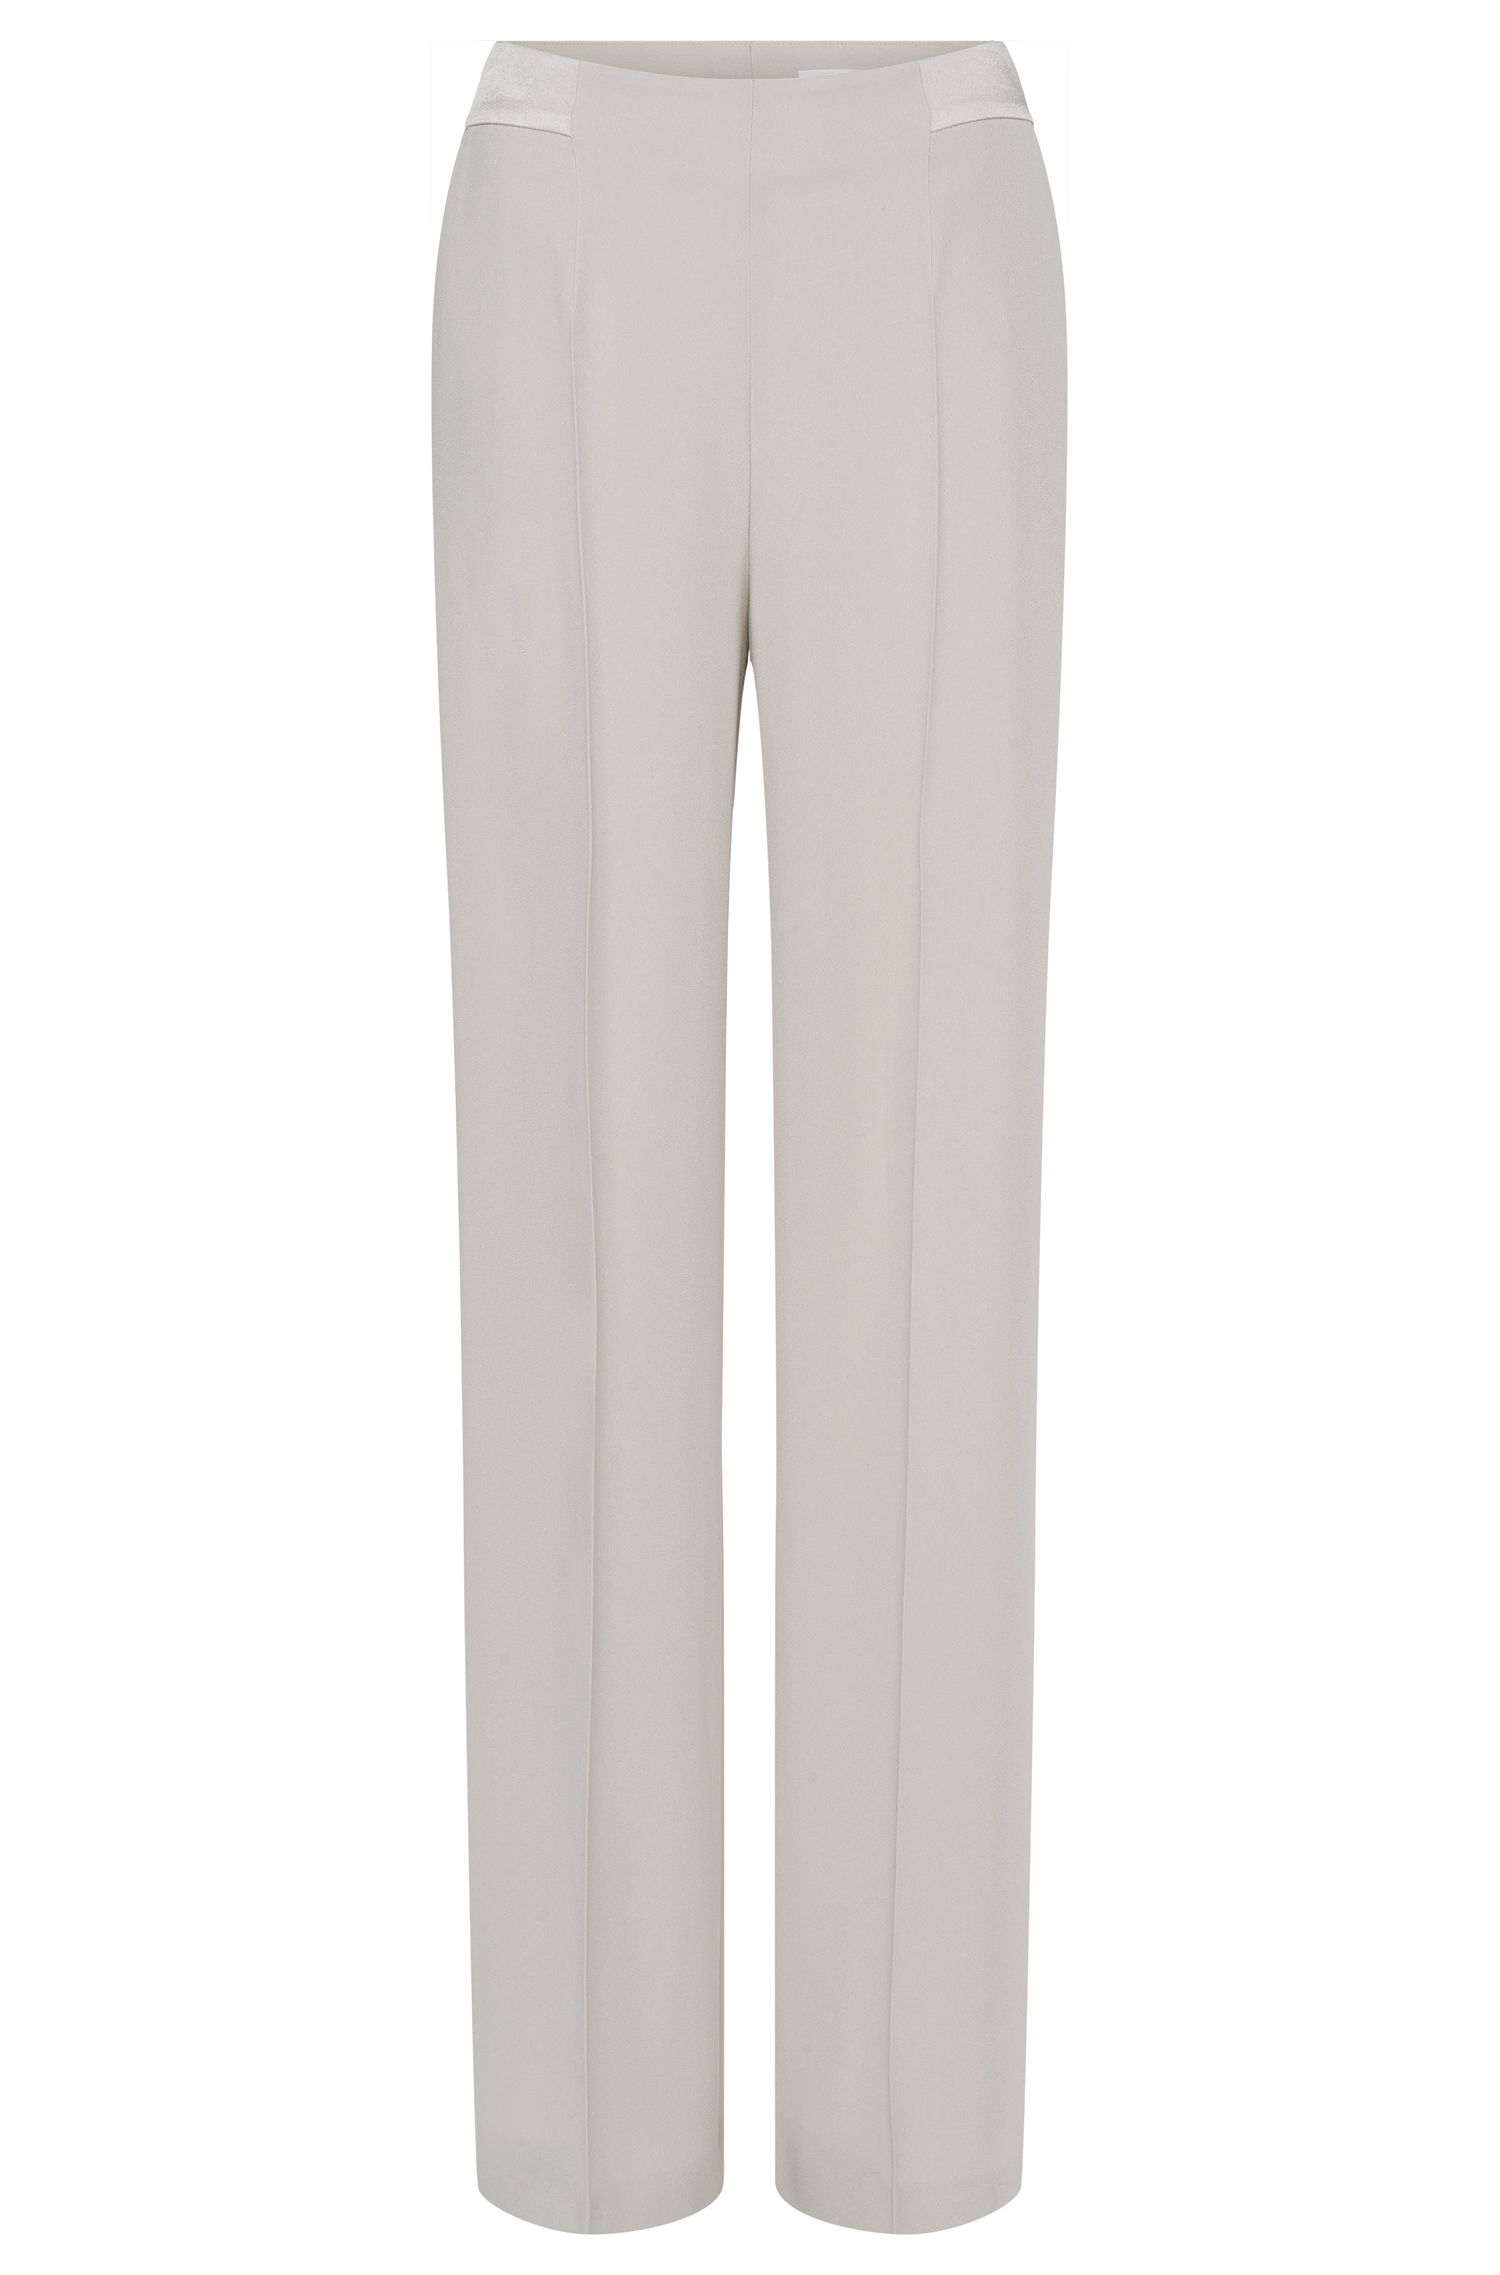 'Temietina' | Crepe Wide-Leg Trousers